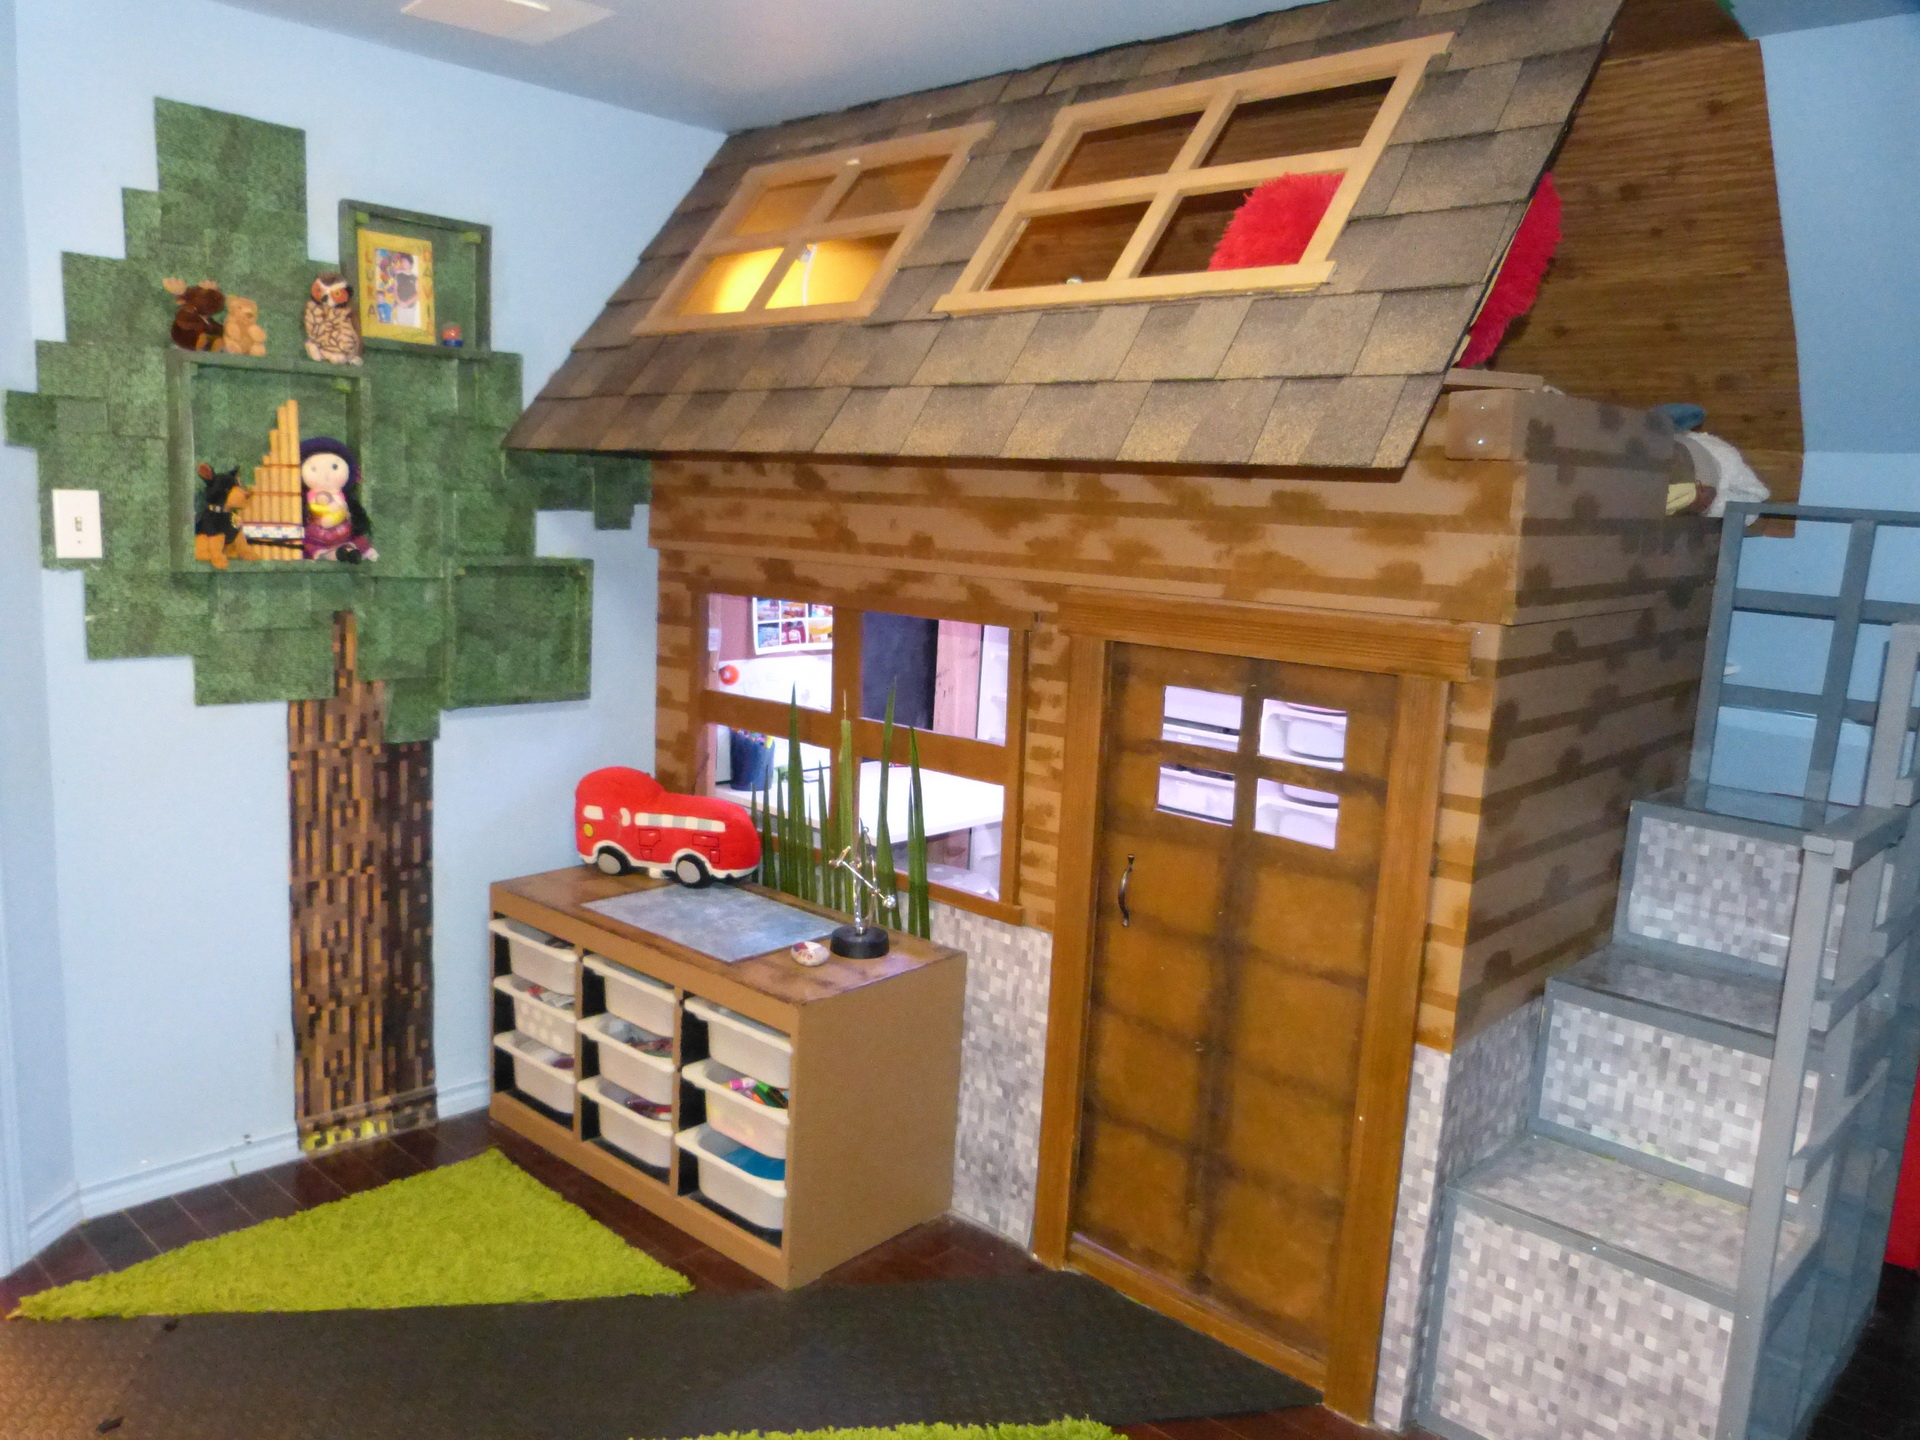 Bedroom furniture ideas minecraft – 10 methods to make it real!